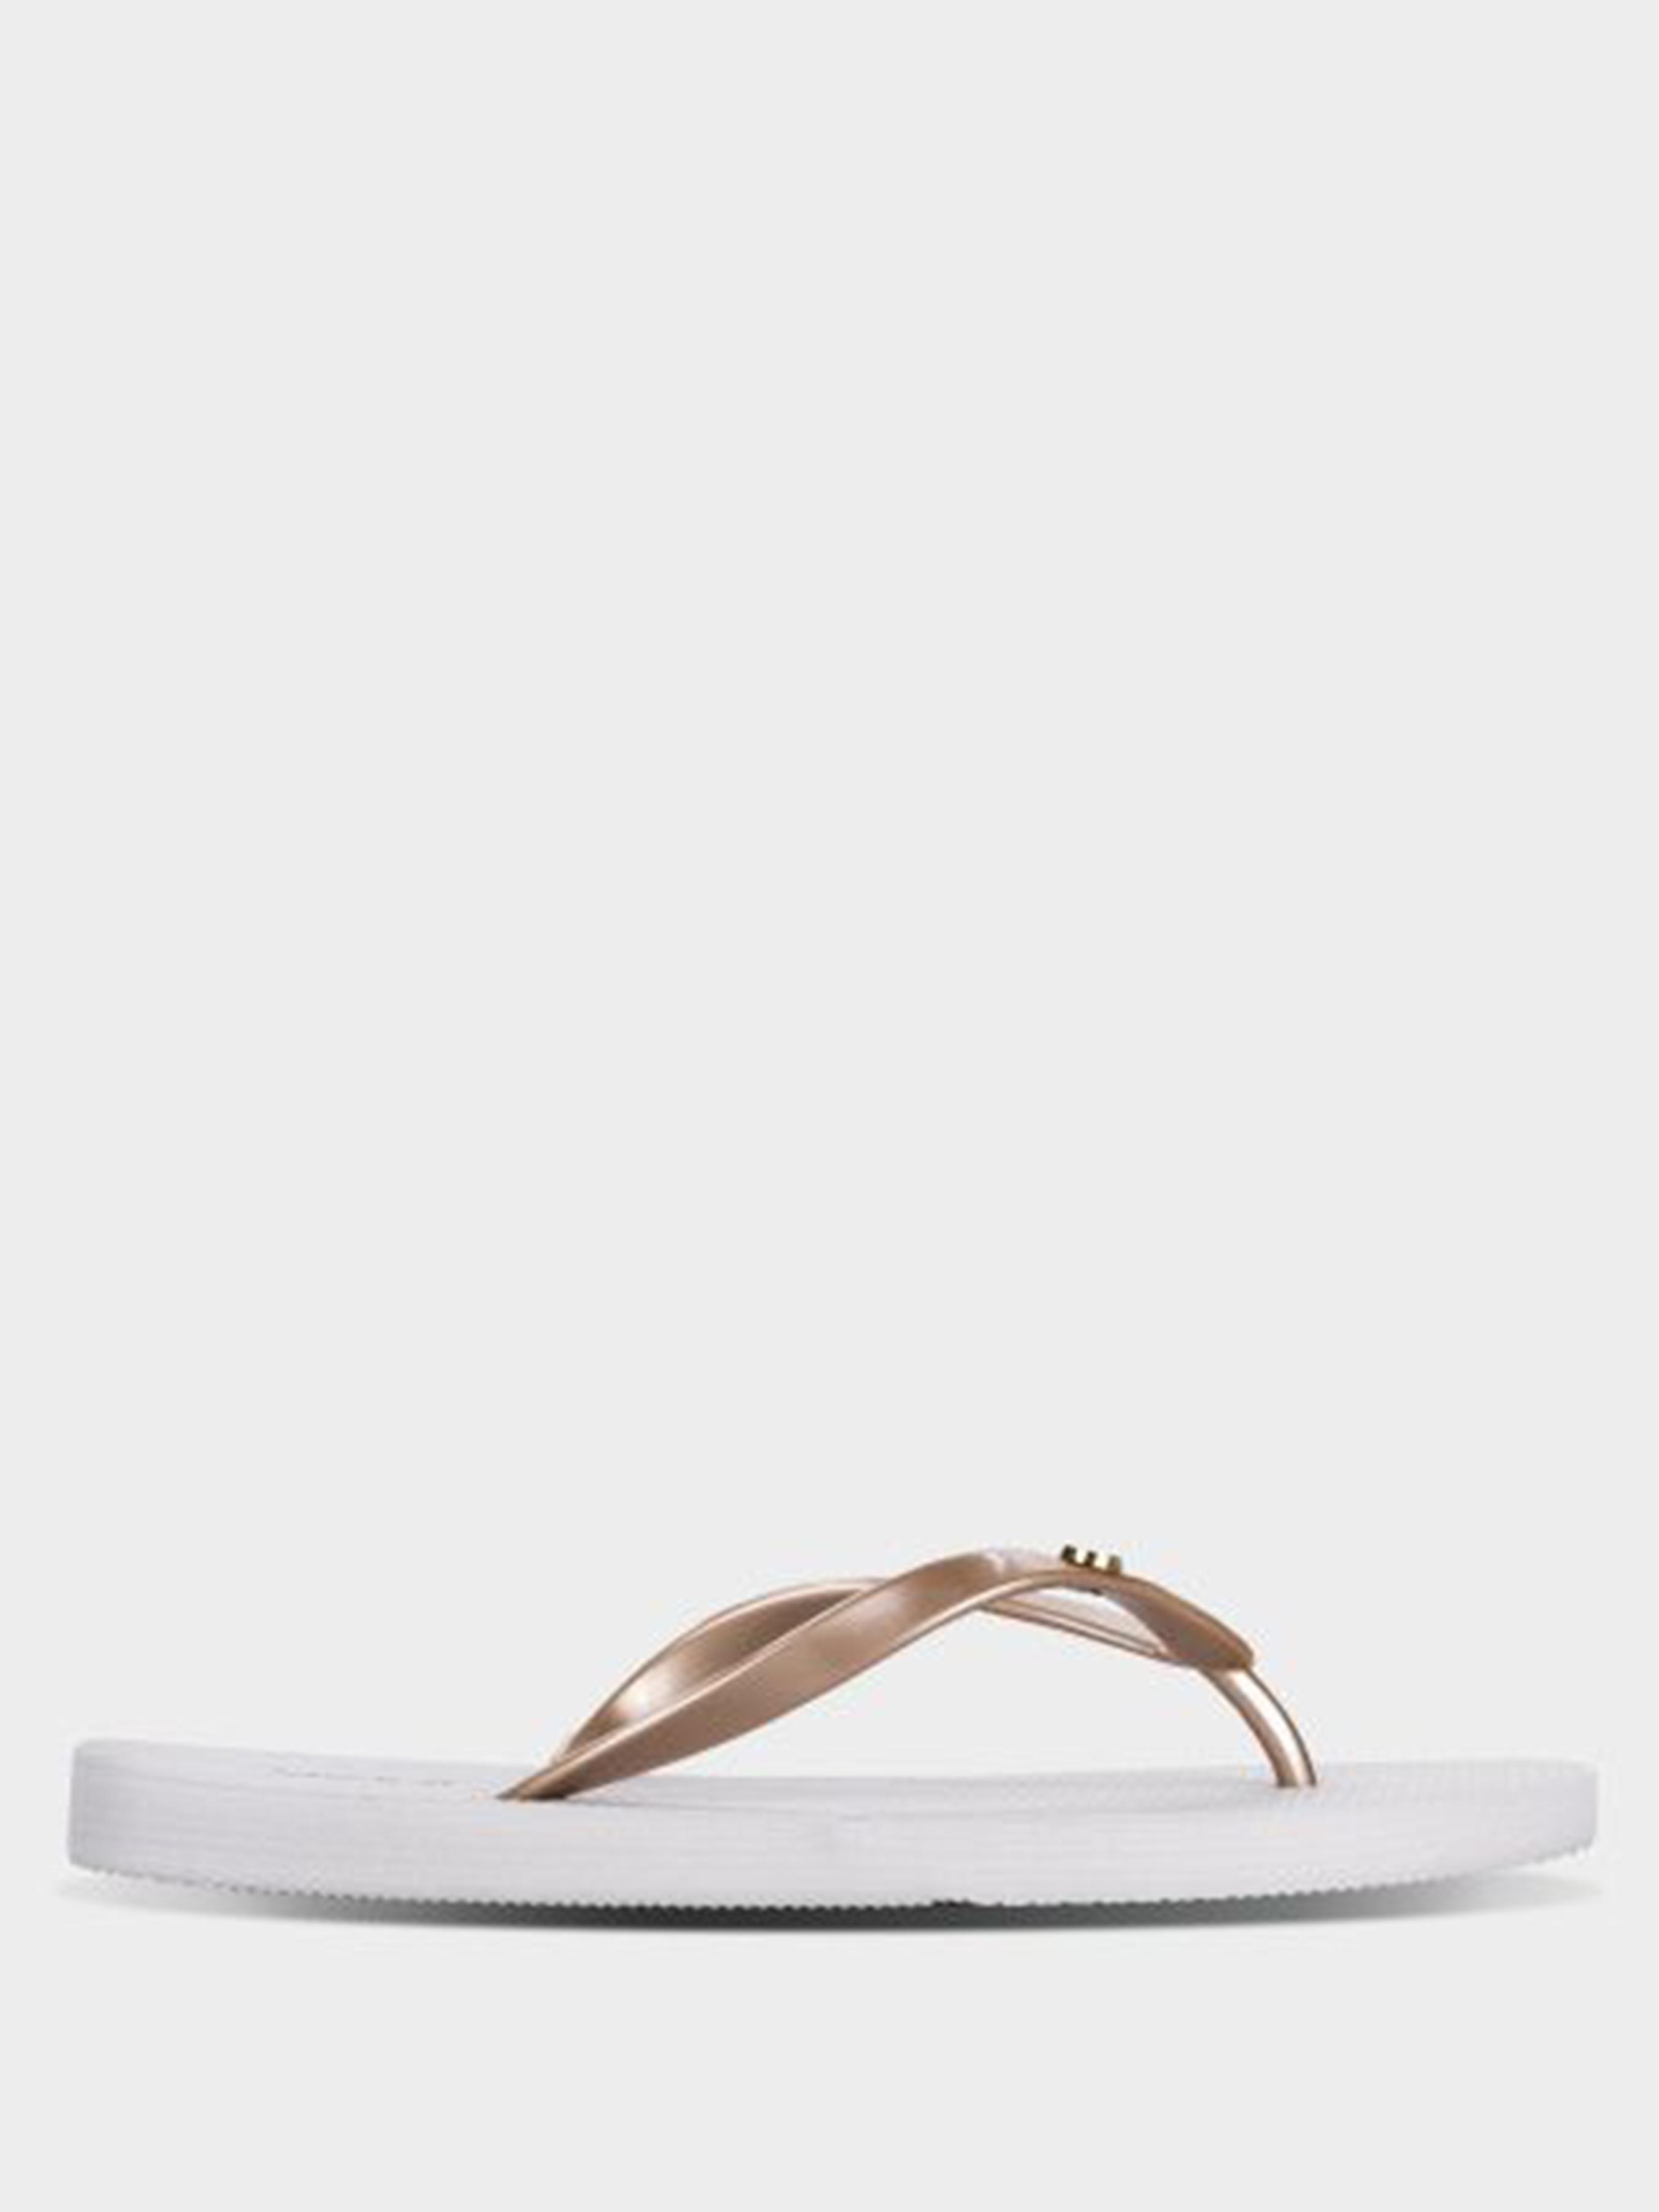 Шлёпанцы женские MEXX Clarissa 7L34 размеры обуви, 2017